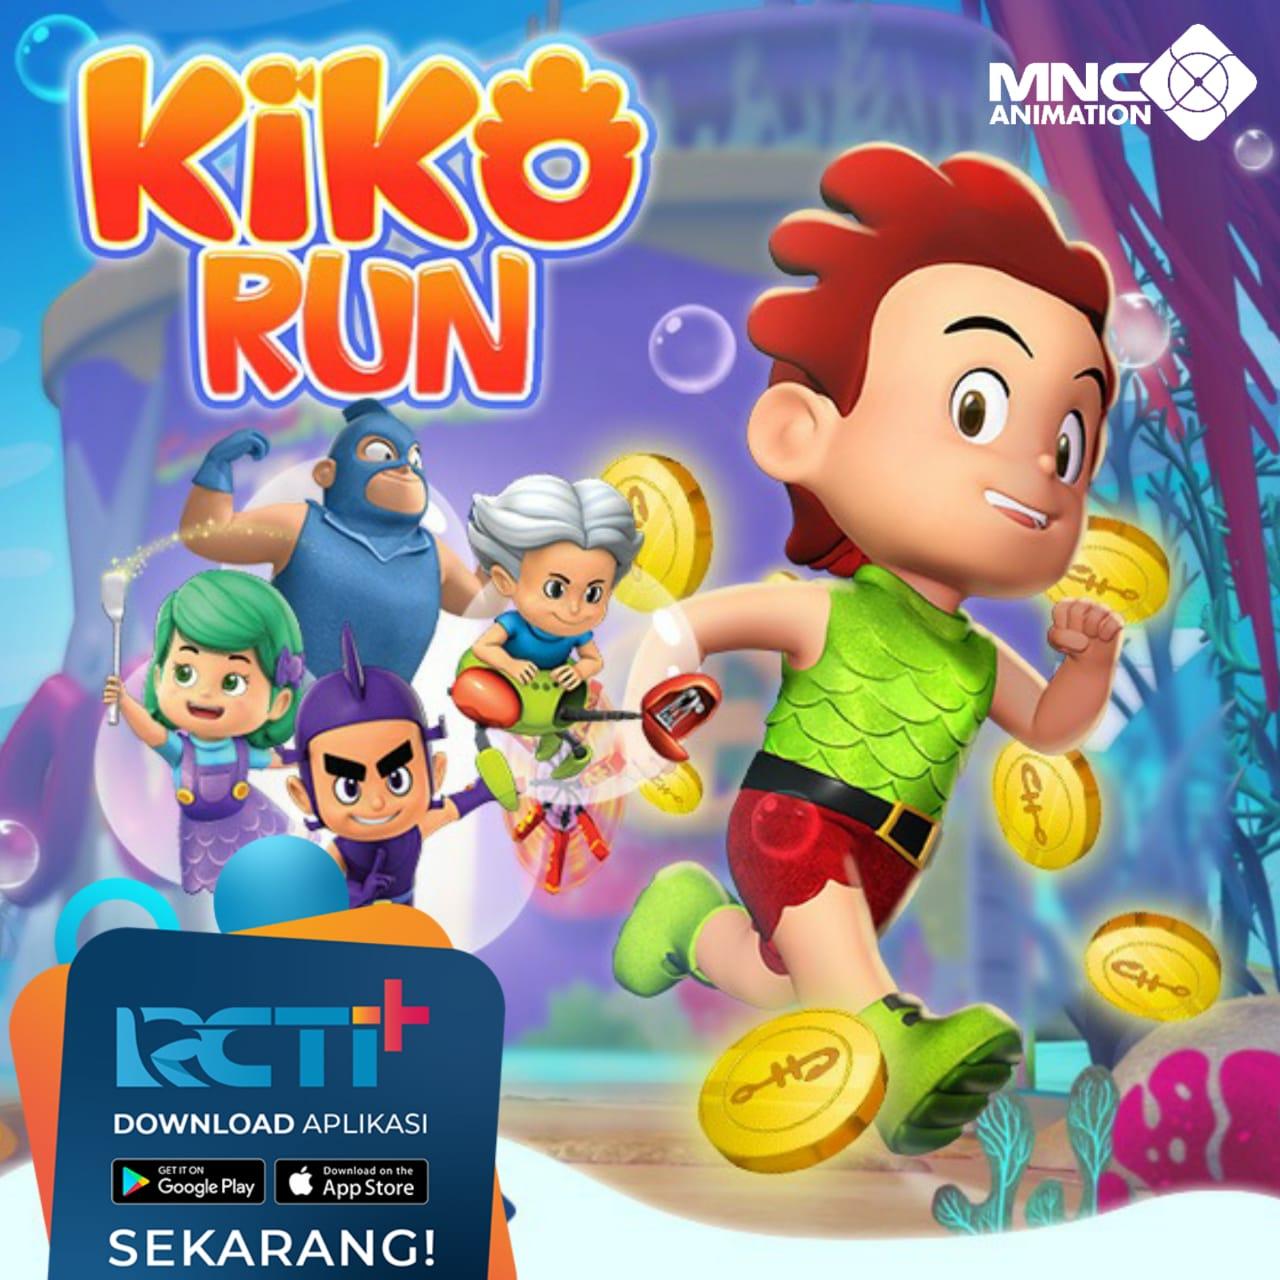 https: img.okezone.com content 2021 01 15 16 2344867 game-endless-run-ayo-berlari-bersama-kiko-di-kiko-run-IS8XvYtA5k.jpg